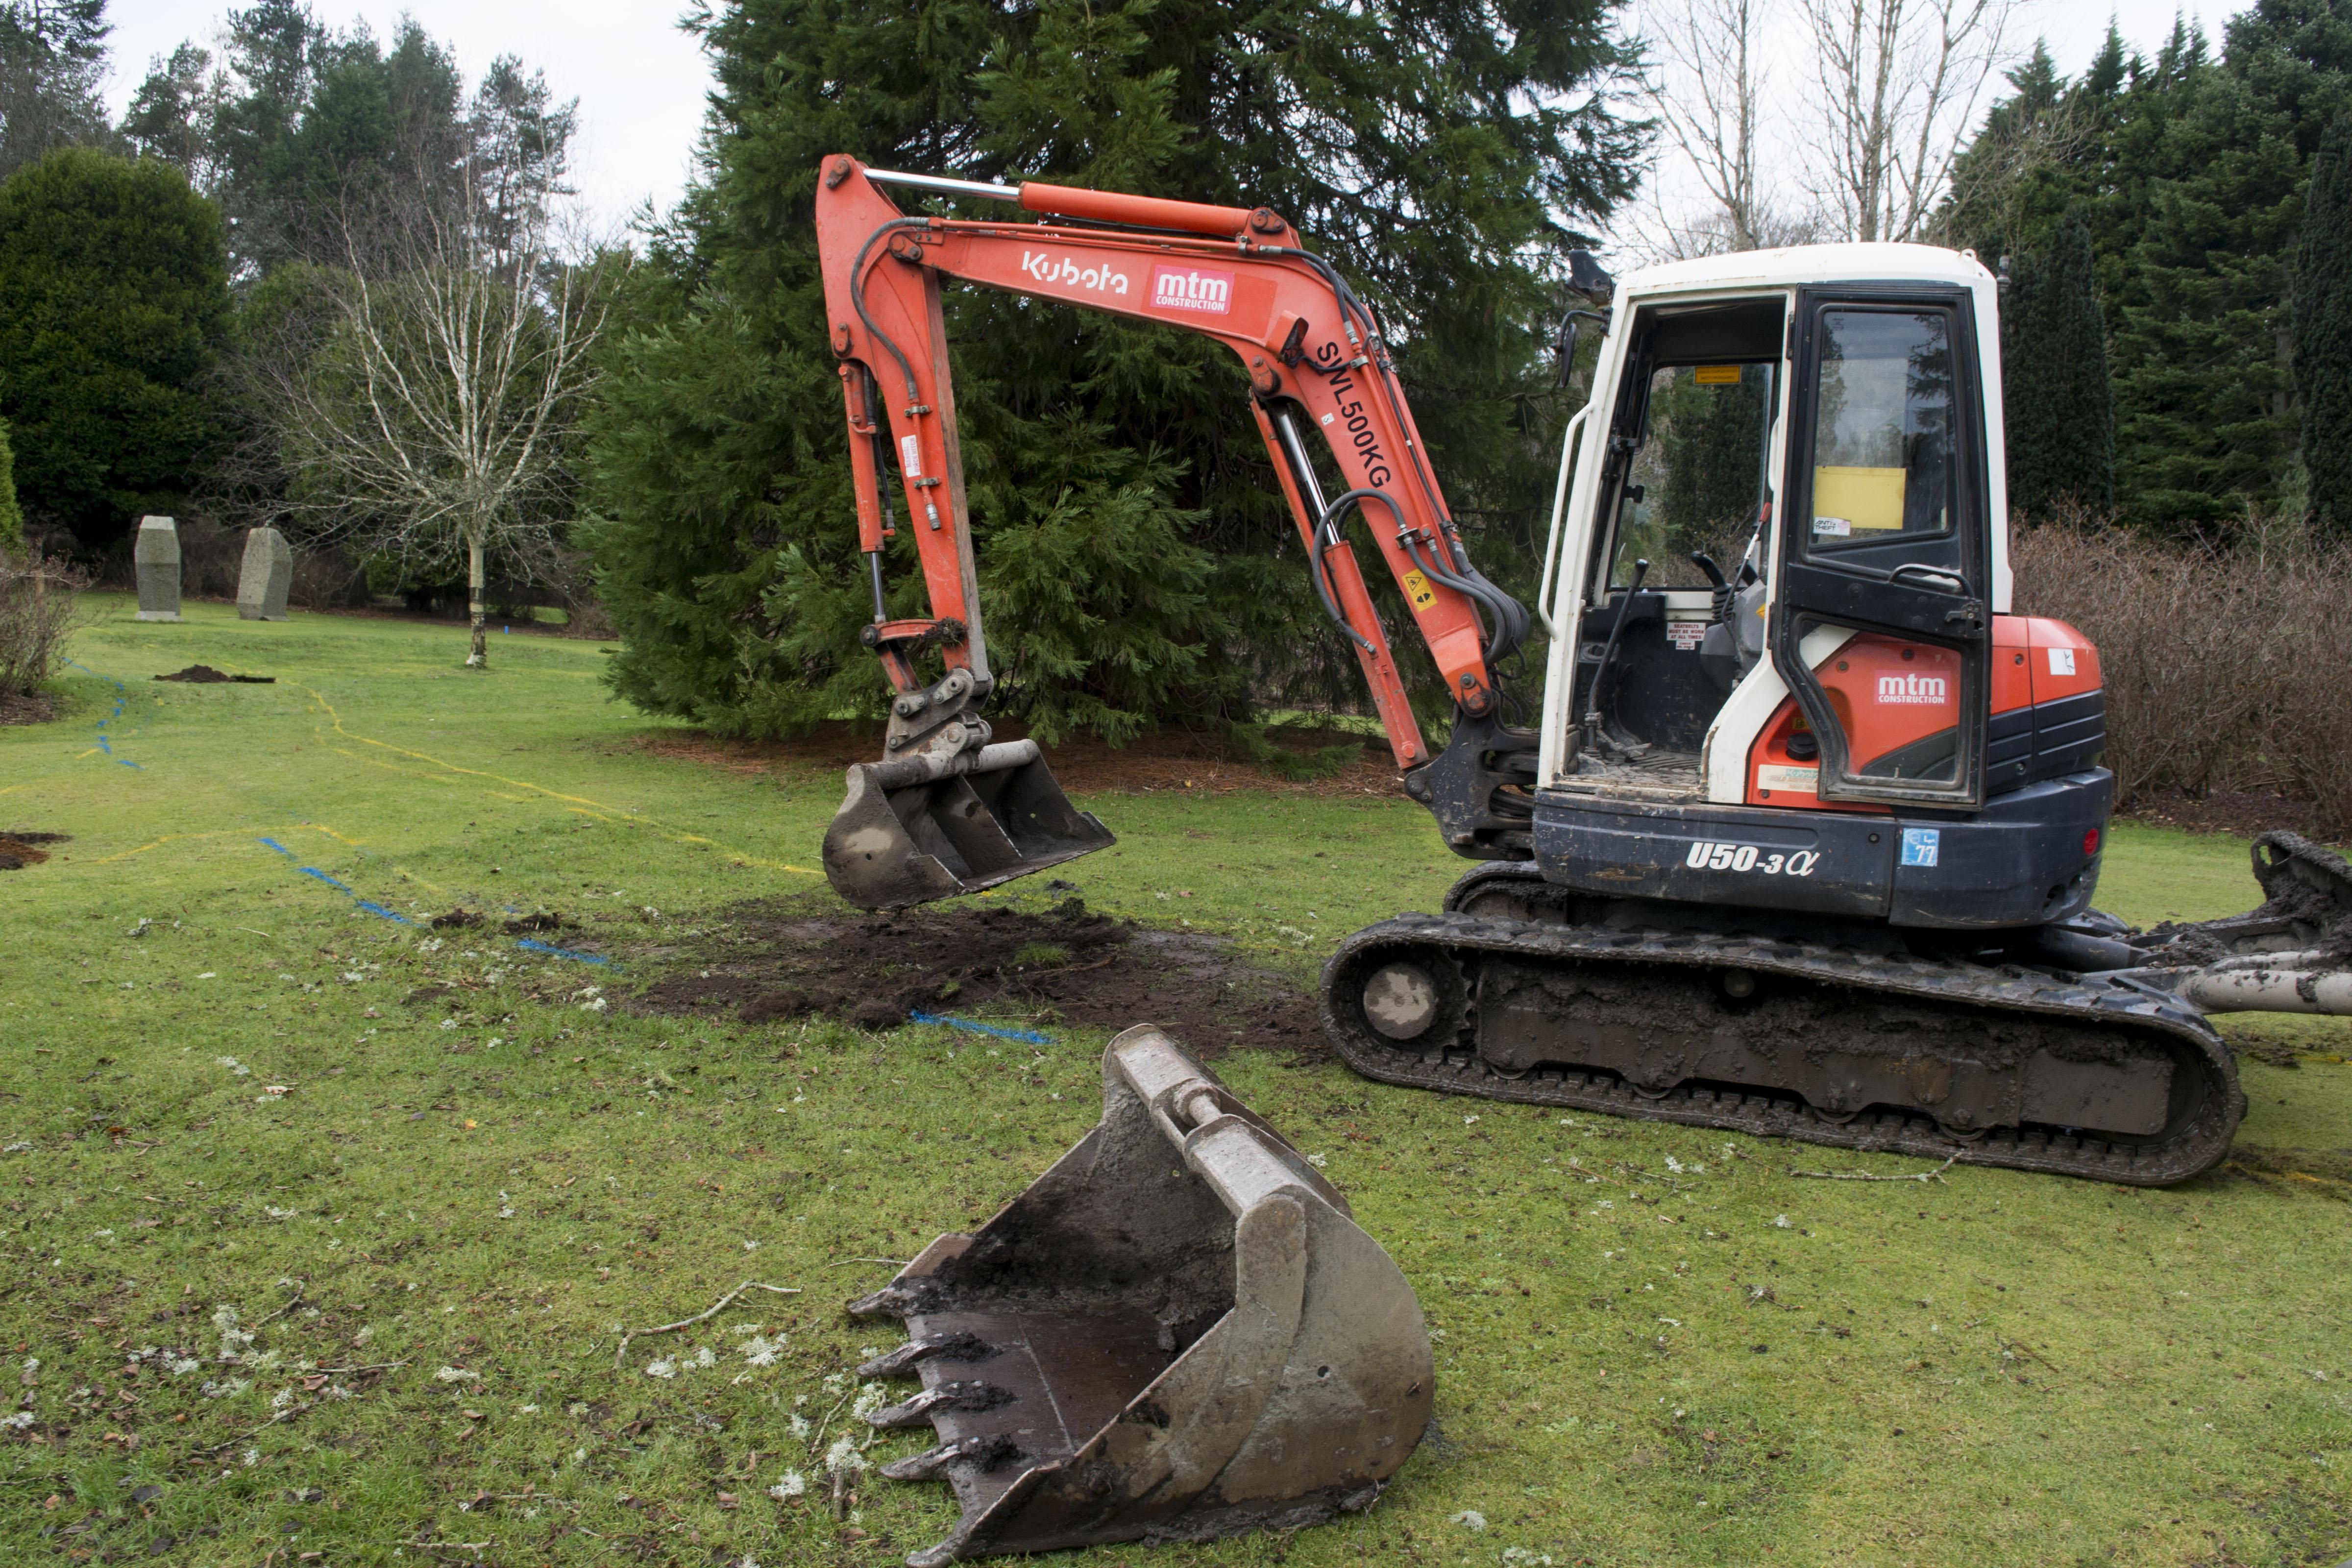 10/01/19-Hazlehead Park, work start on site of new baby memorial area